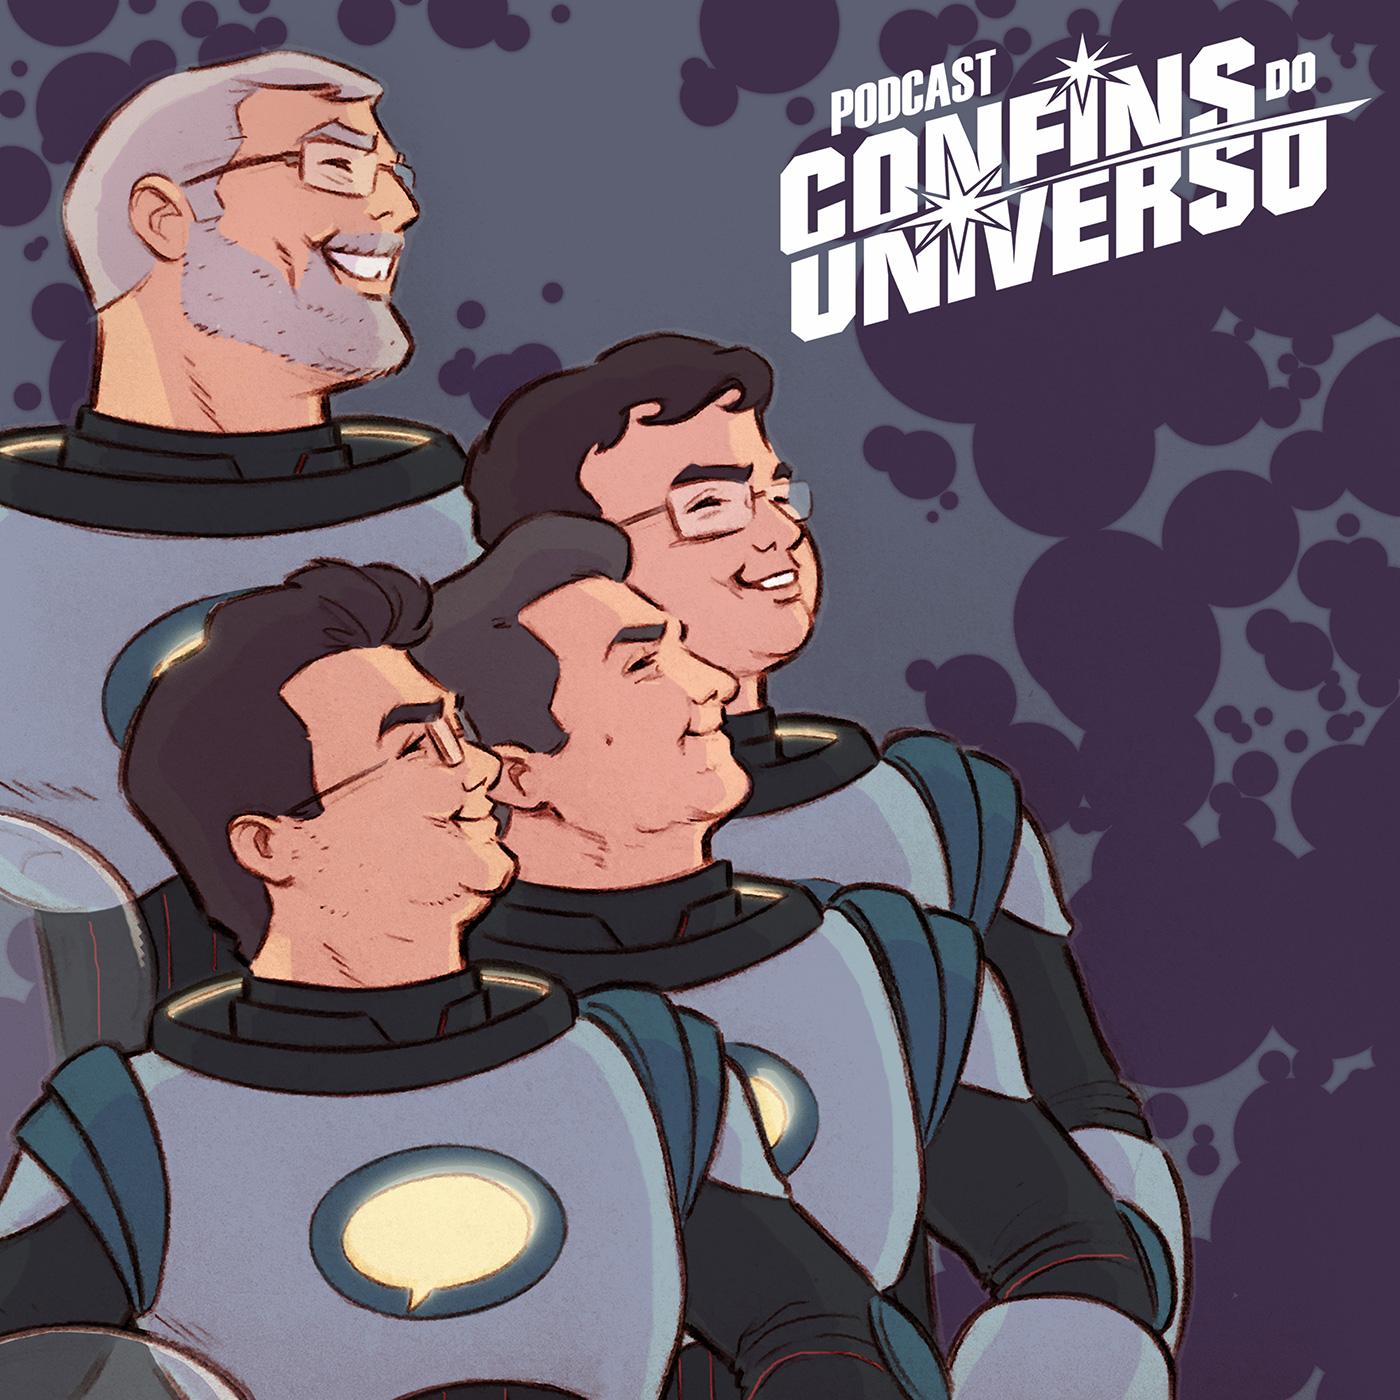 Confins do Universo, por Vitor Cafaggi